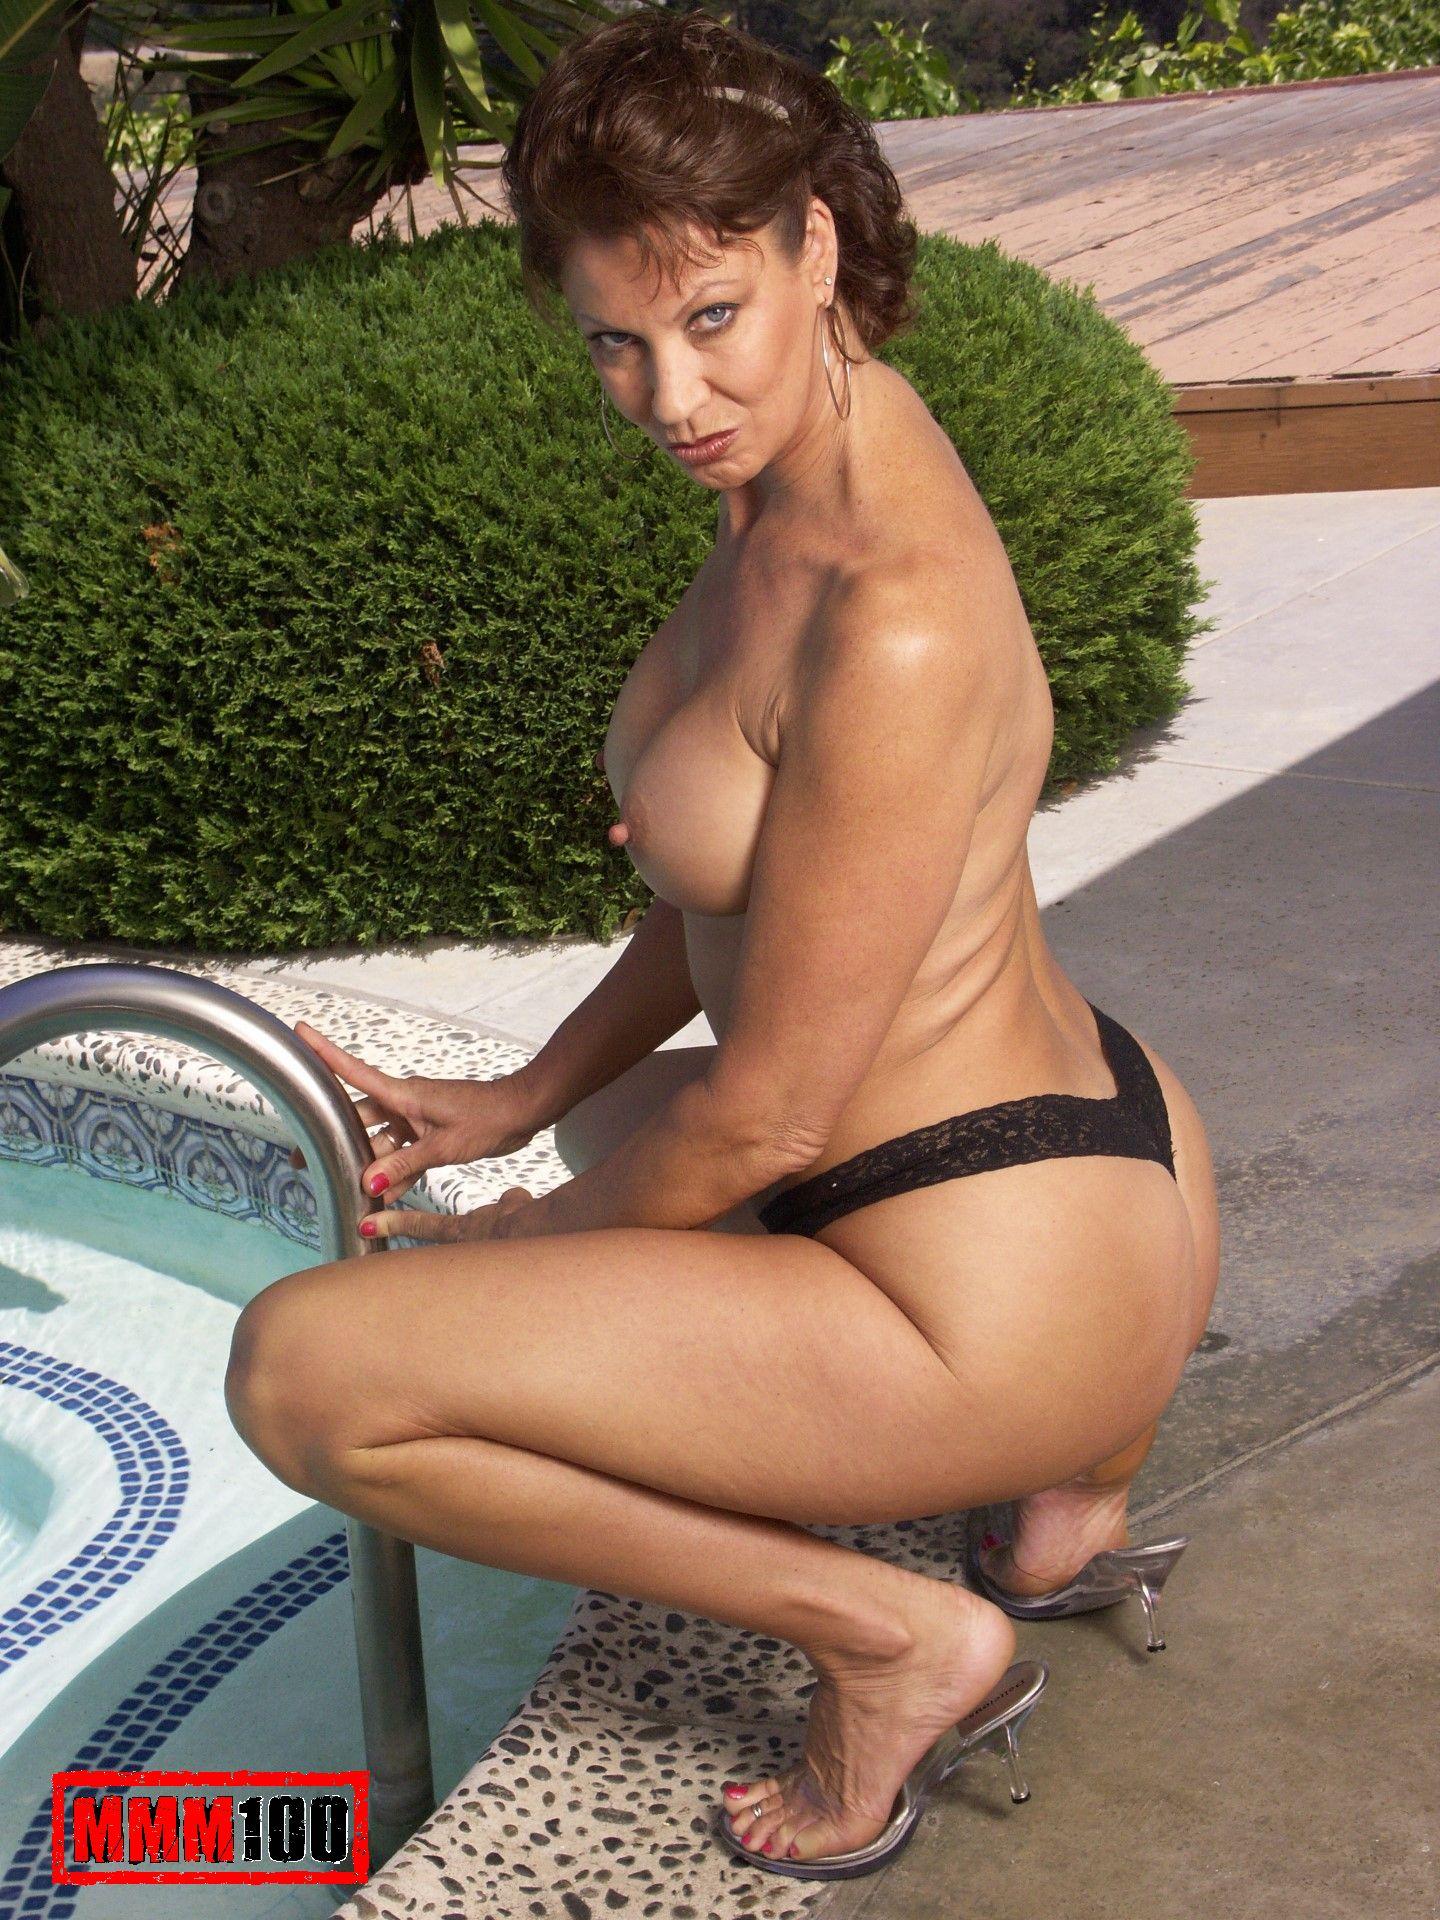 Videl nuda erotic submissive cuties